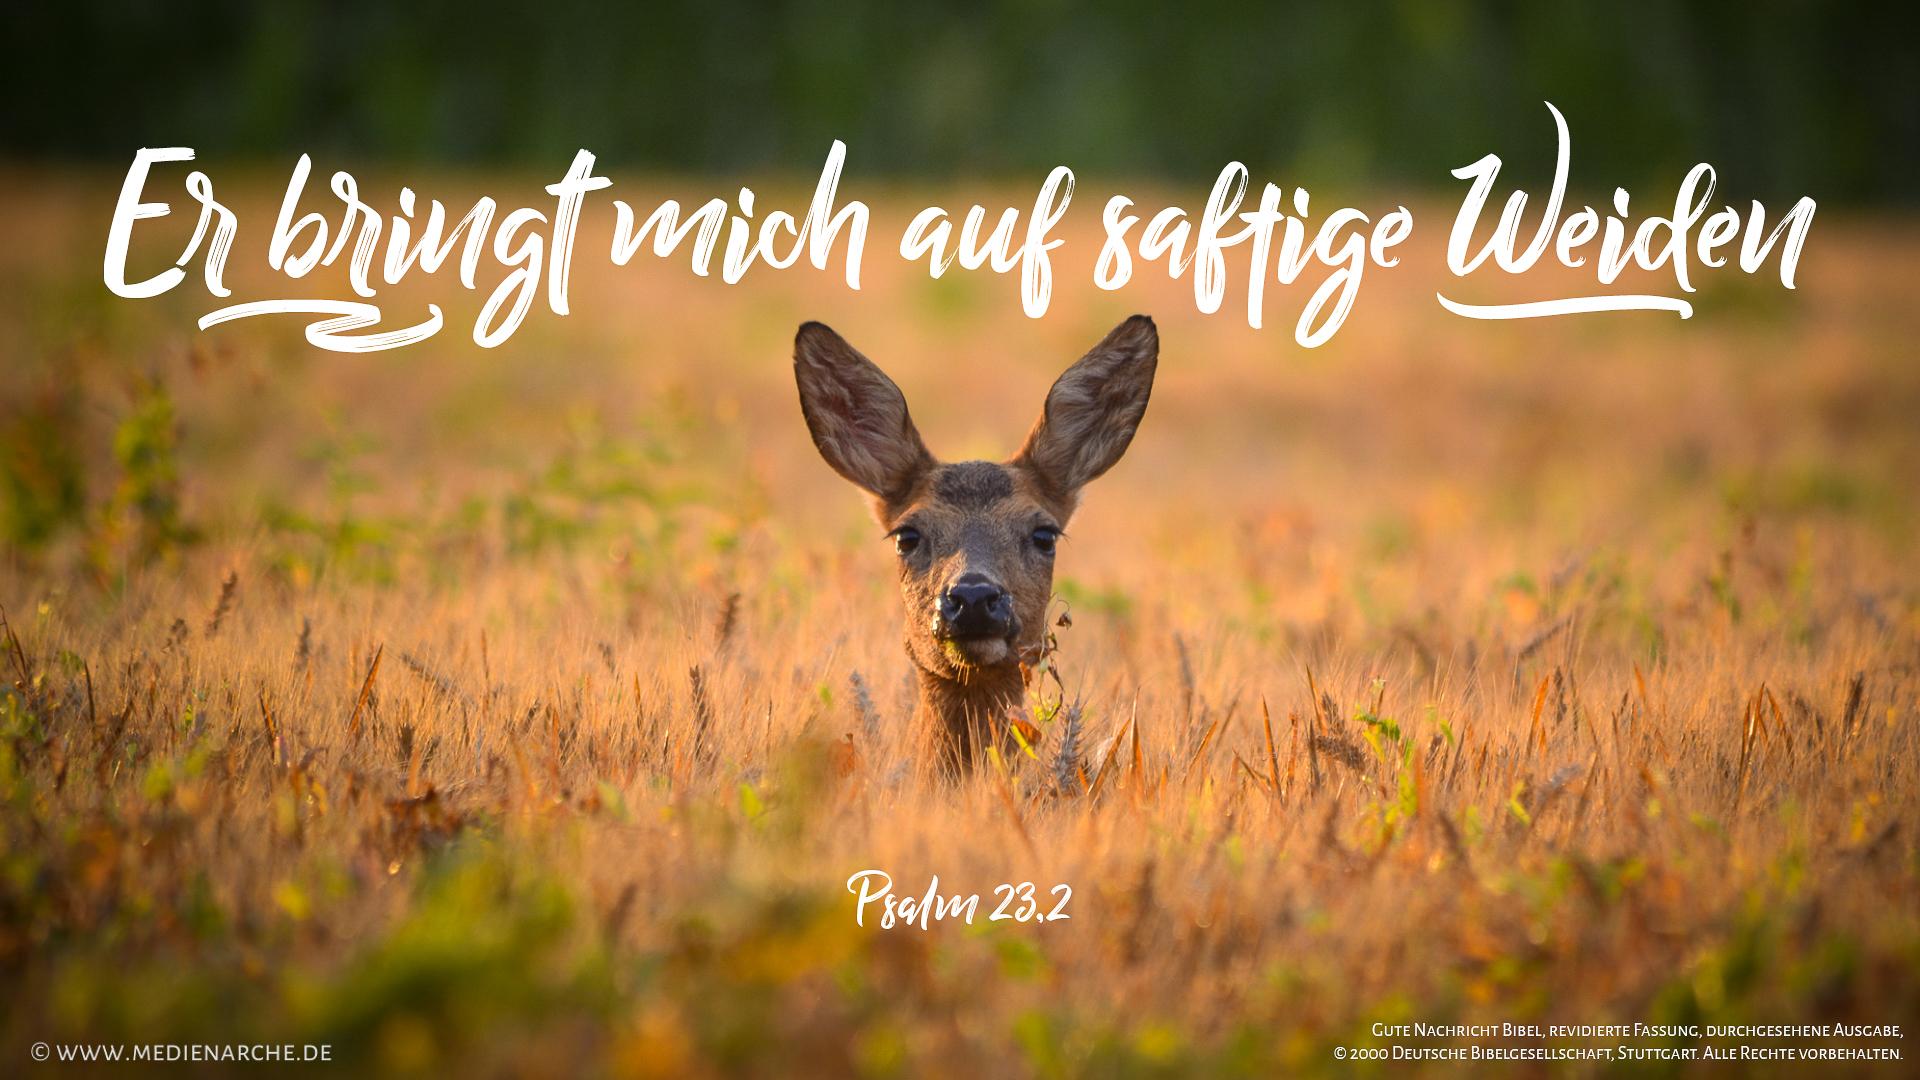 psalm-23-2_16_9_hd1080.jpg